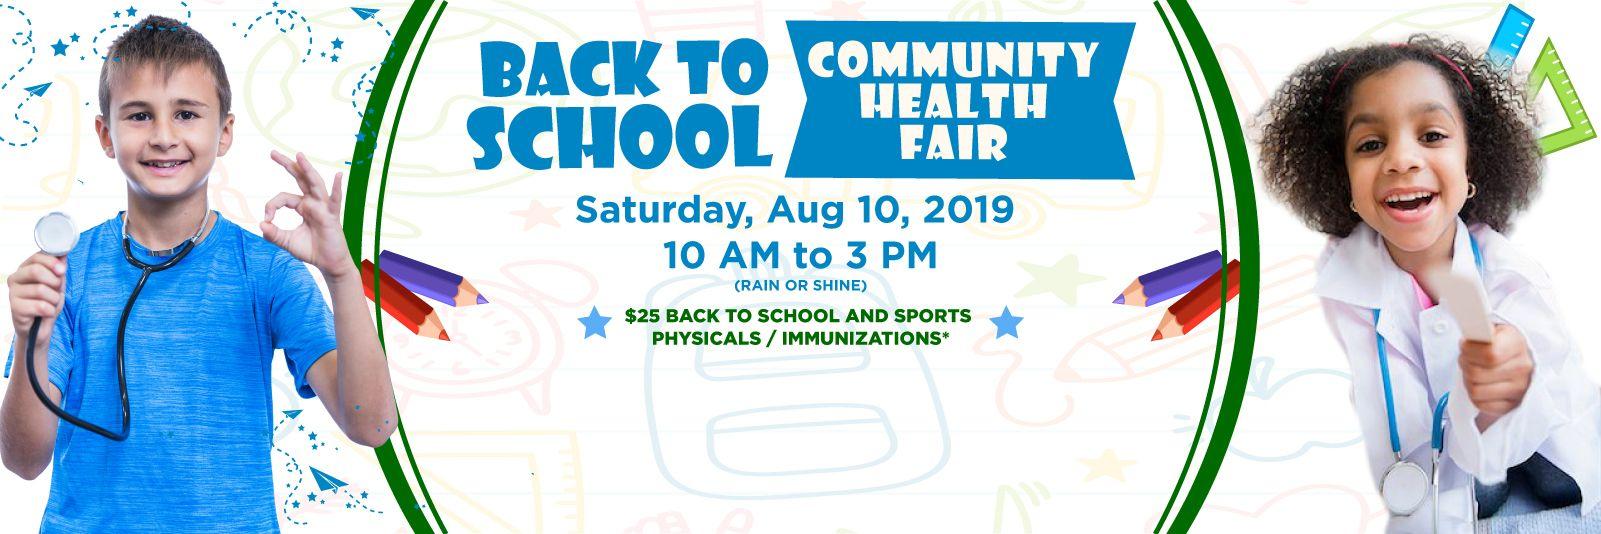 back-to-school-community-health-fair